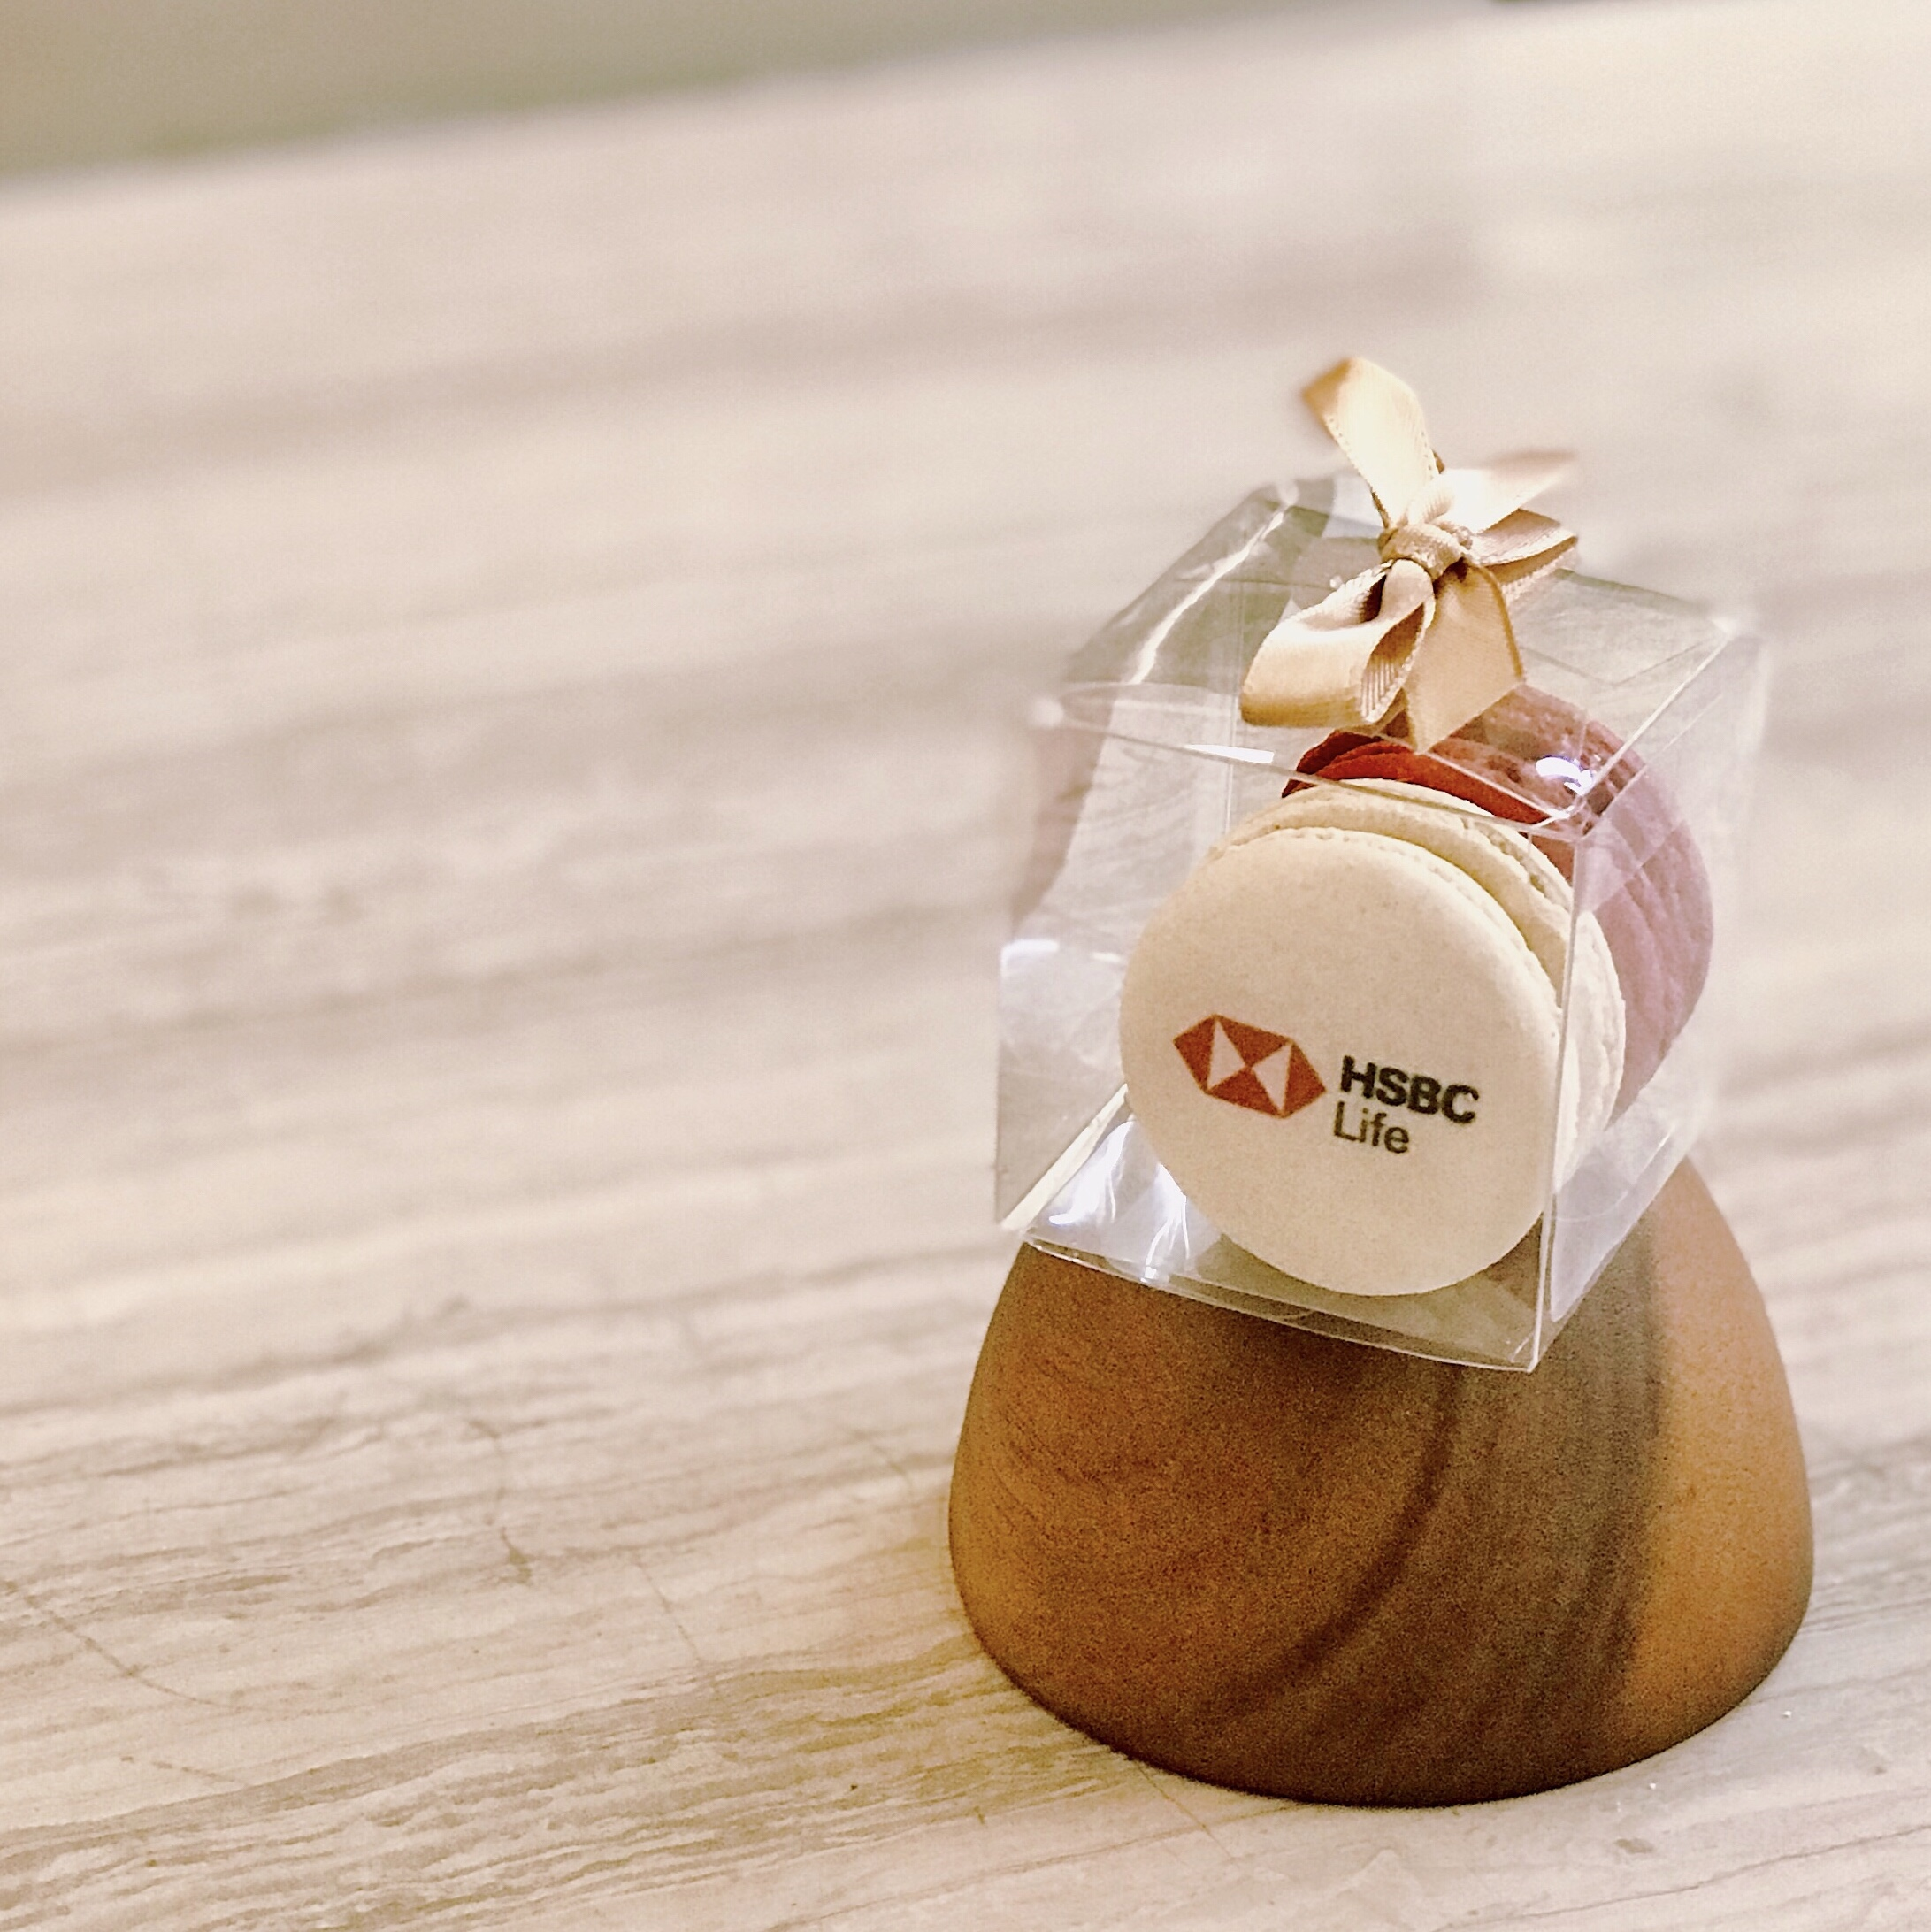 Macaron Gift Idea (2 Macarons)